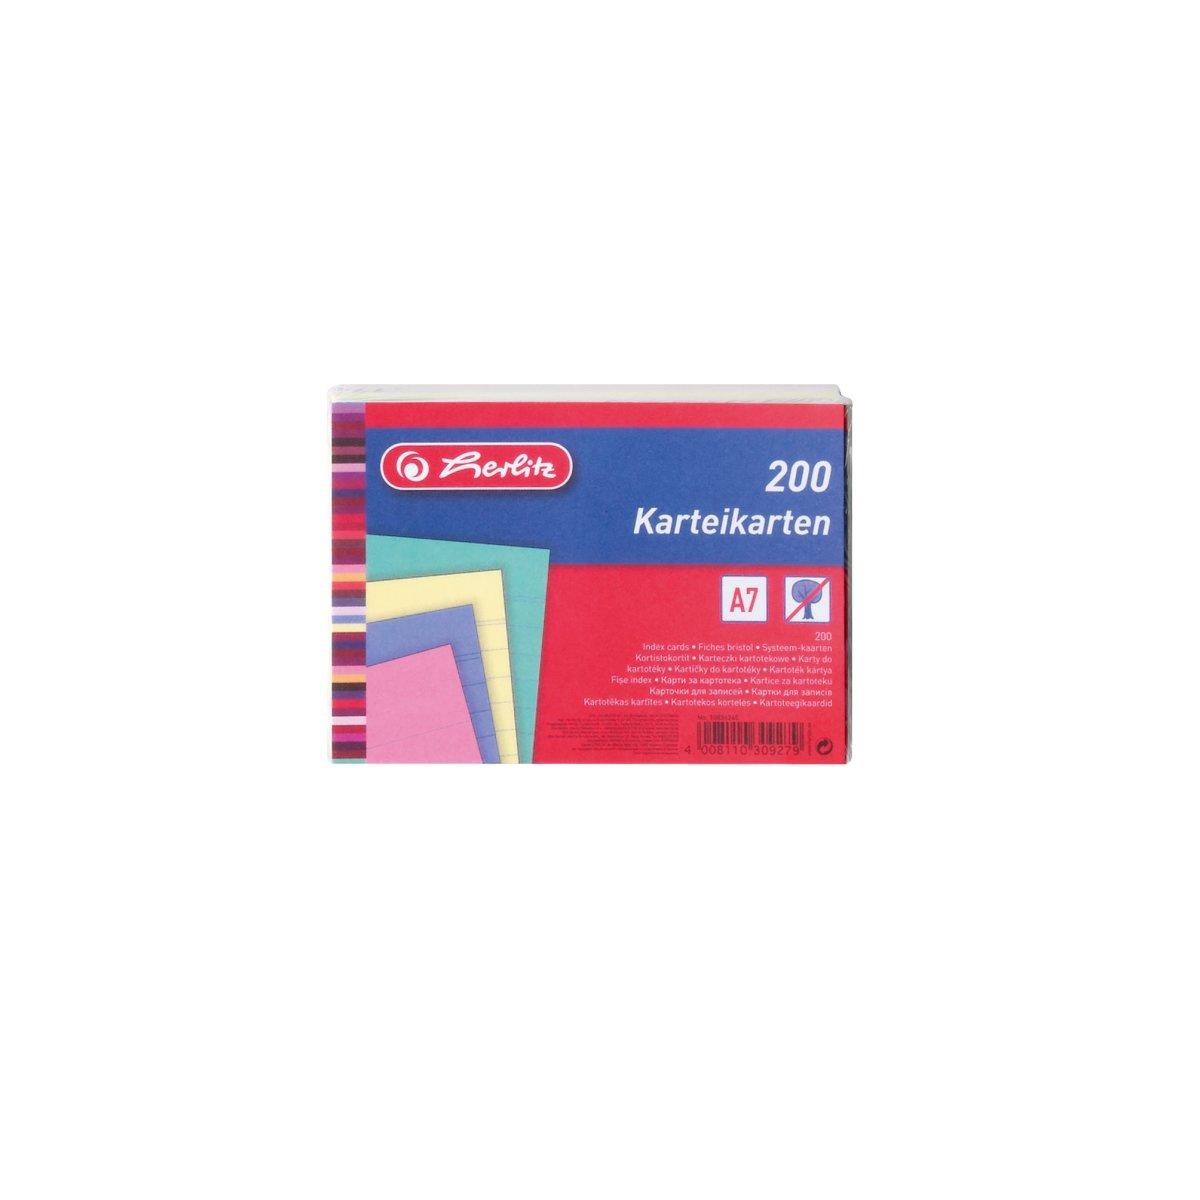 Herlitz 10836245 - Blau - Grün - Pink - Gelb - 200 Stück(e)